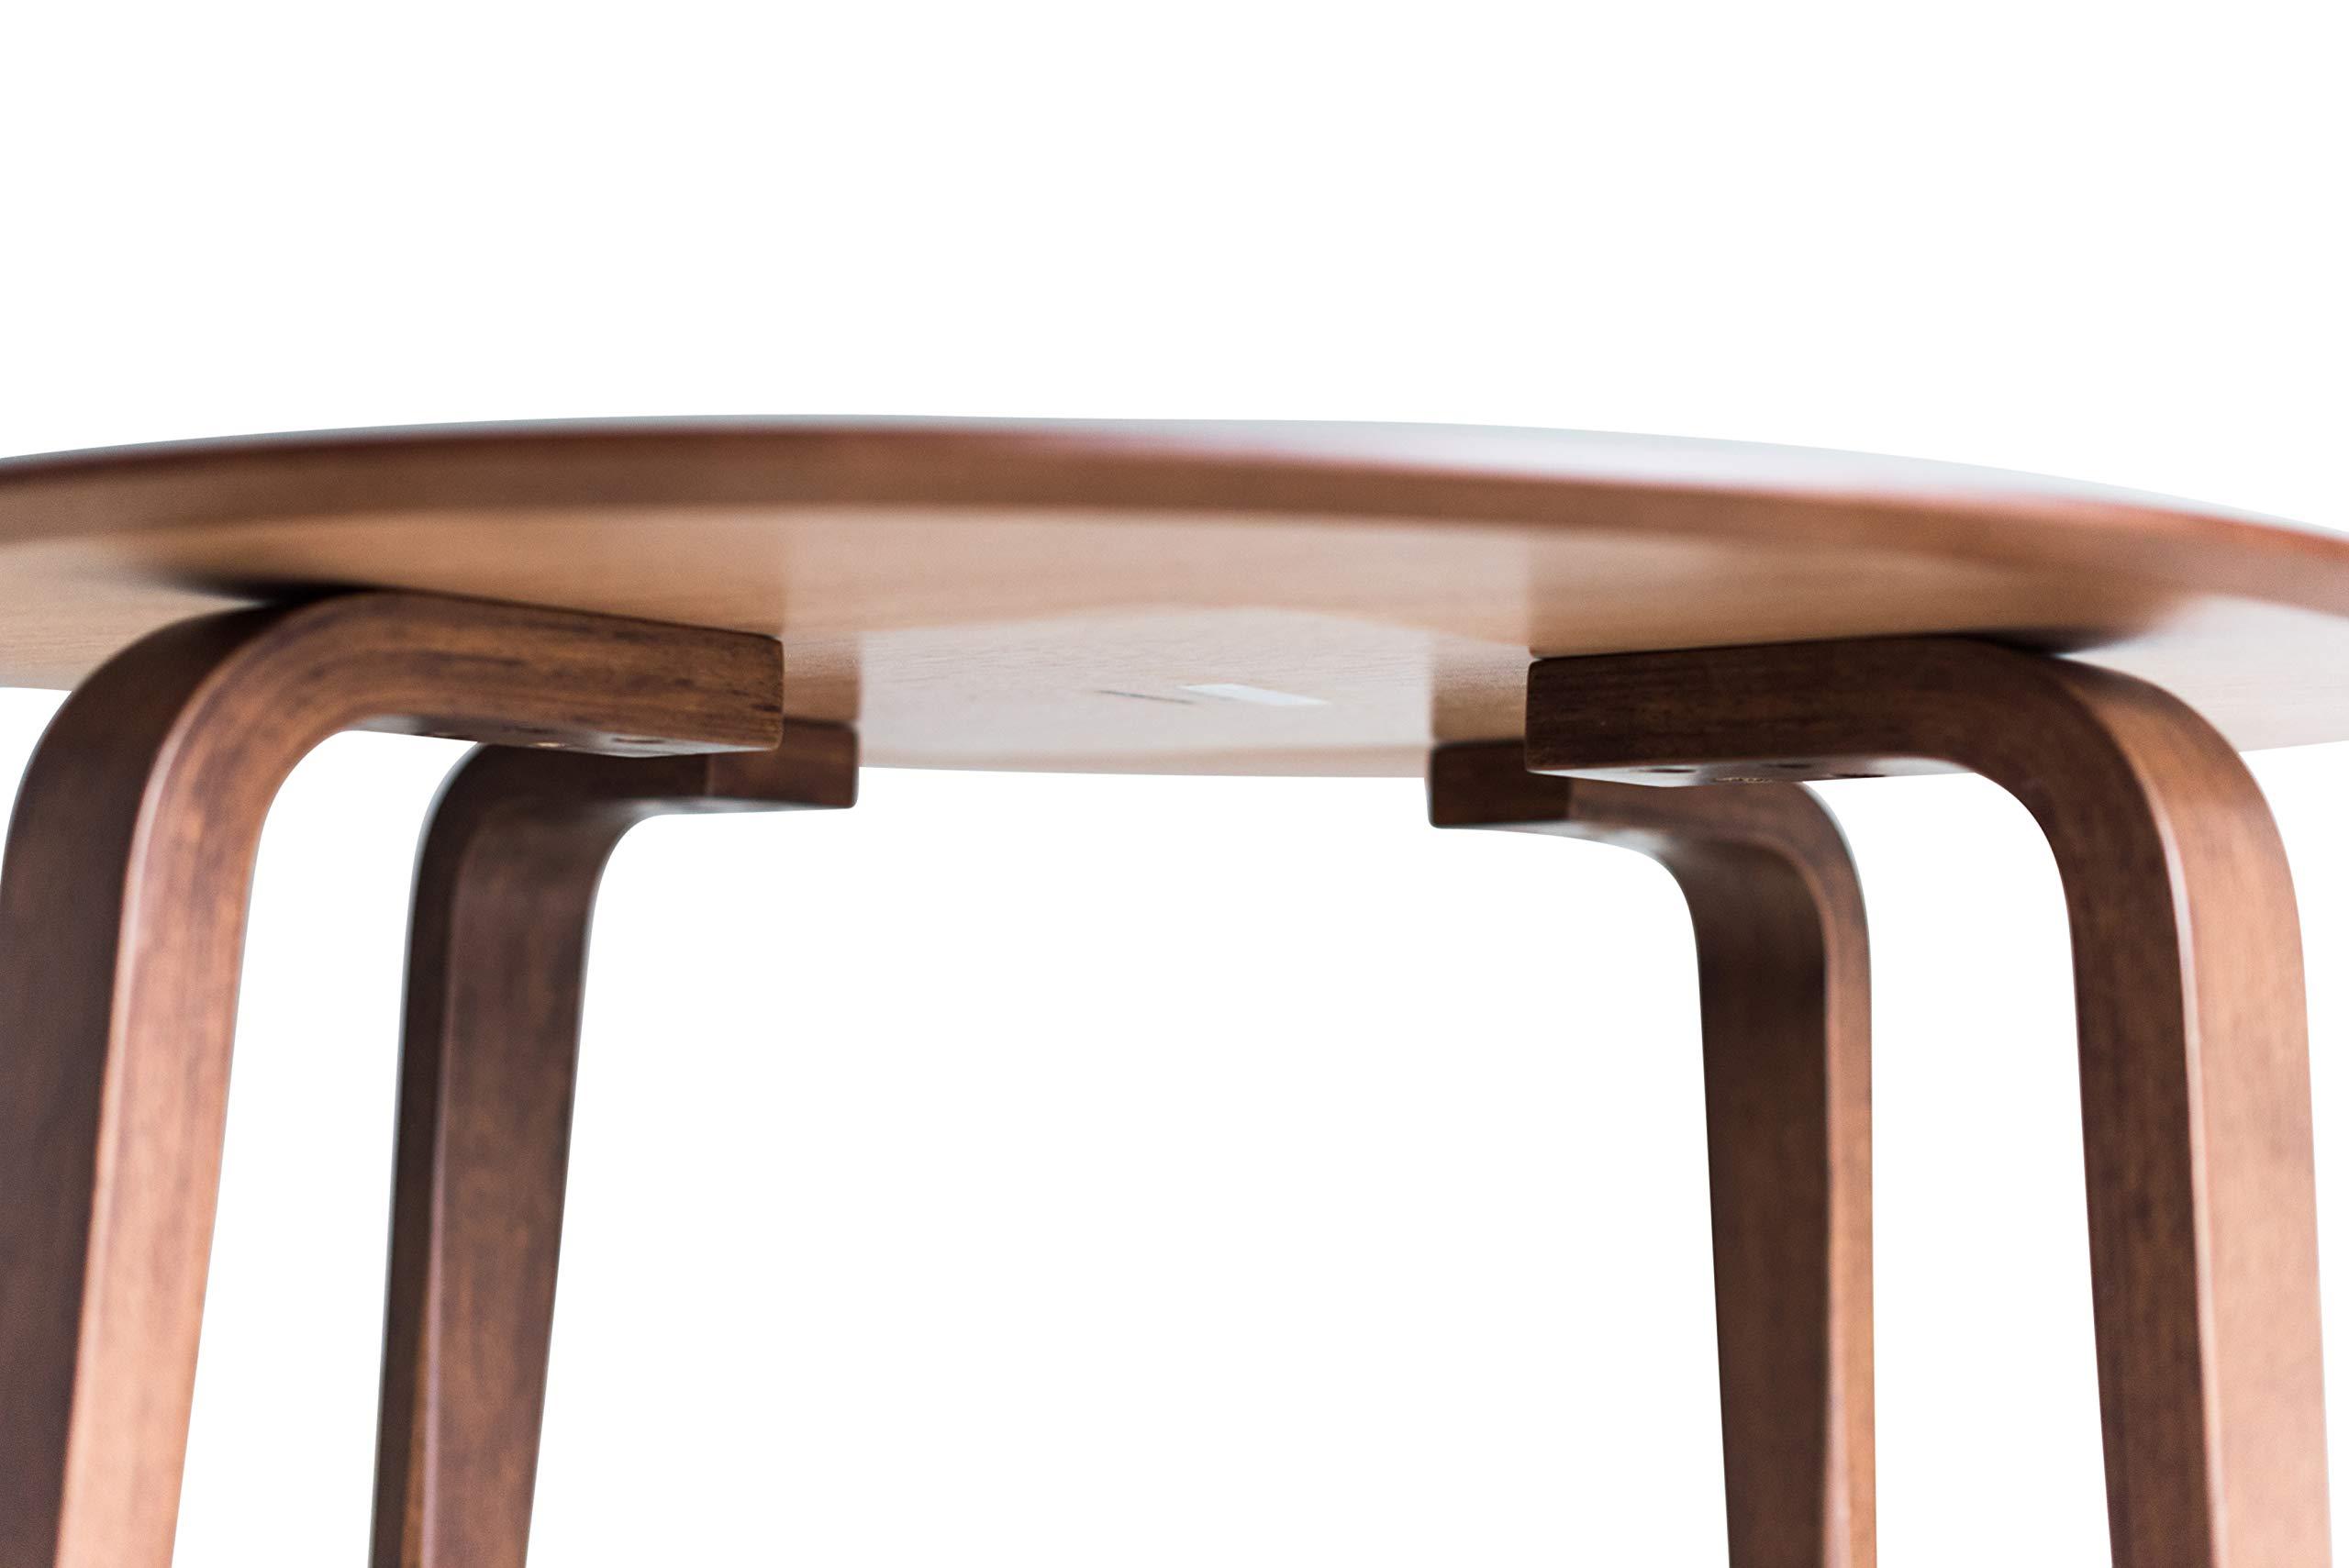 Edloe Finch YUMI Mid-Century Modern Round Dining Table Kitchen Walnut by Edloe Finch (Image #9)